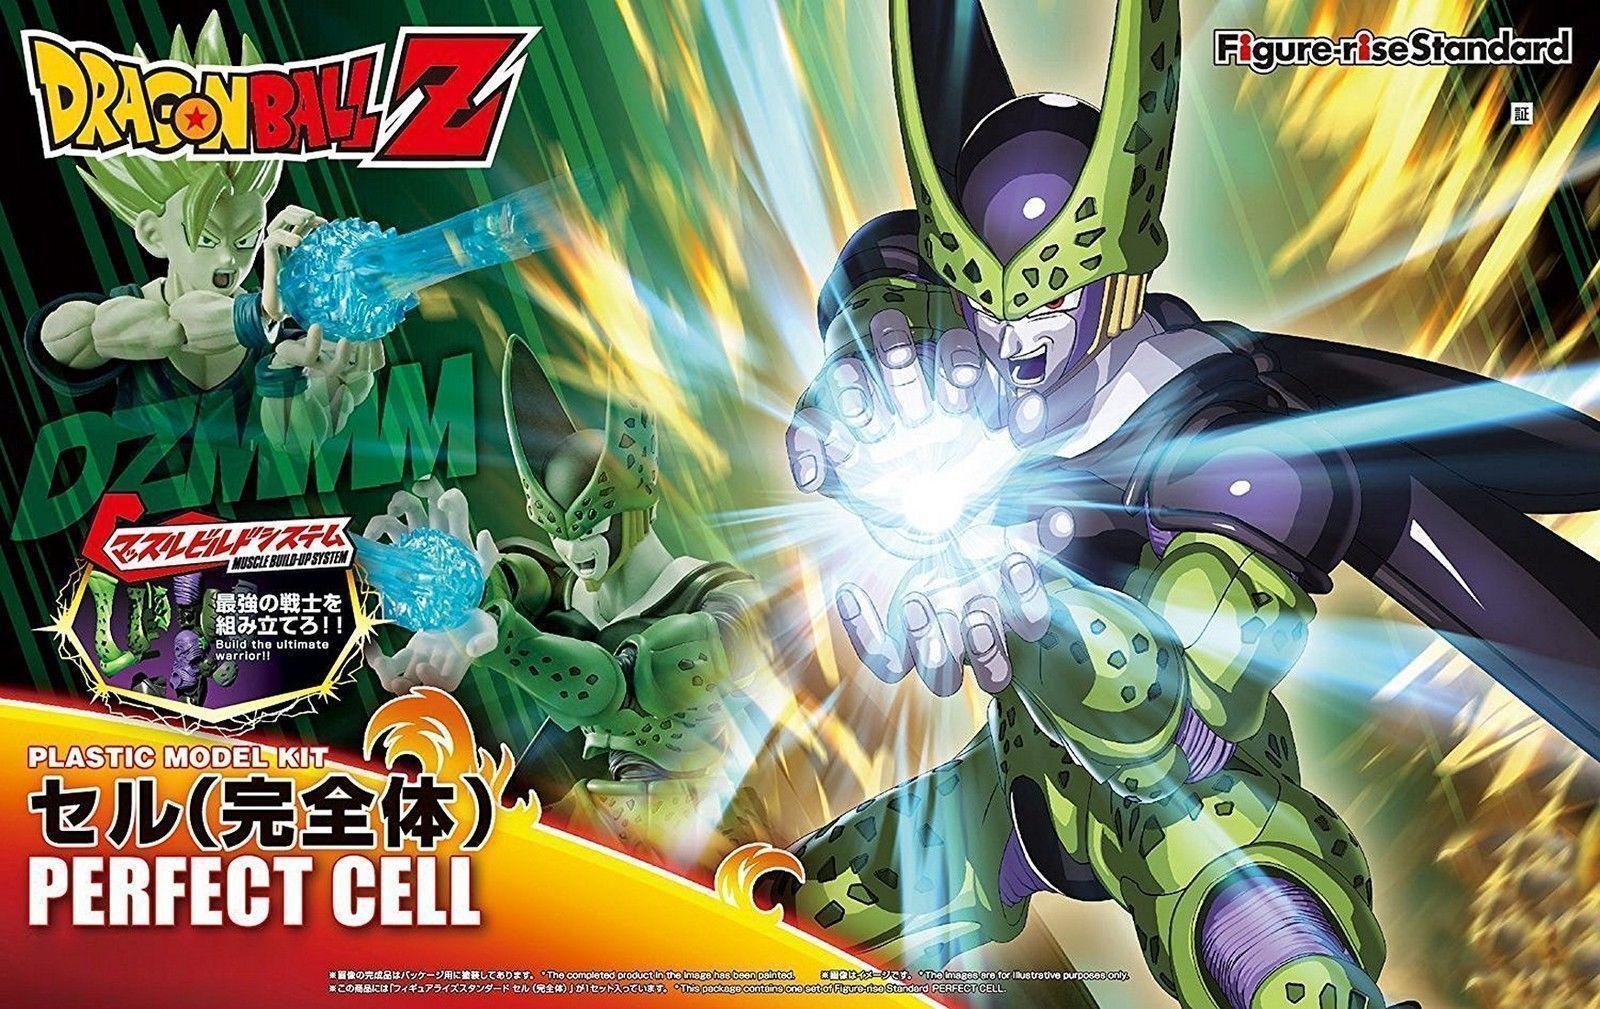 Model Kit - Dragon Ball Z - Perfect Cell Figure-rise Standar